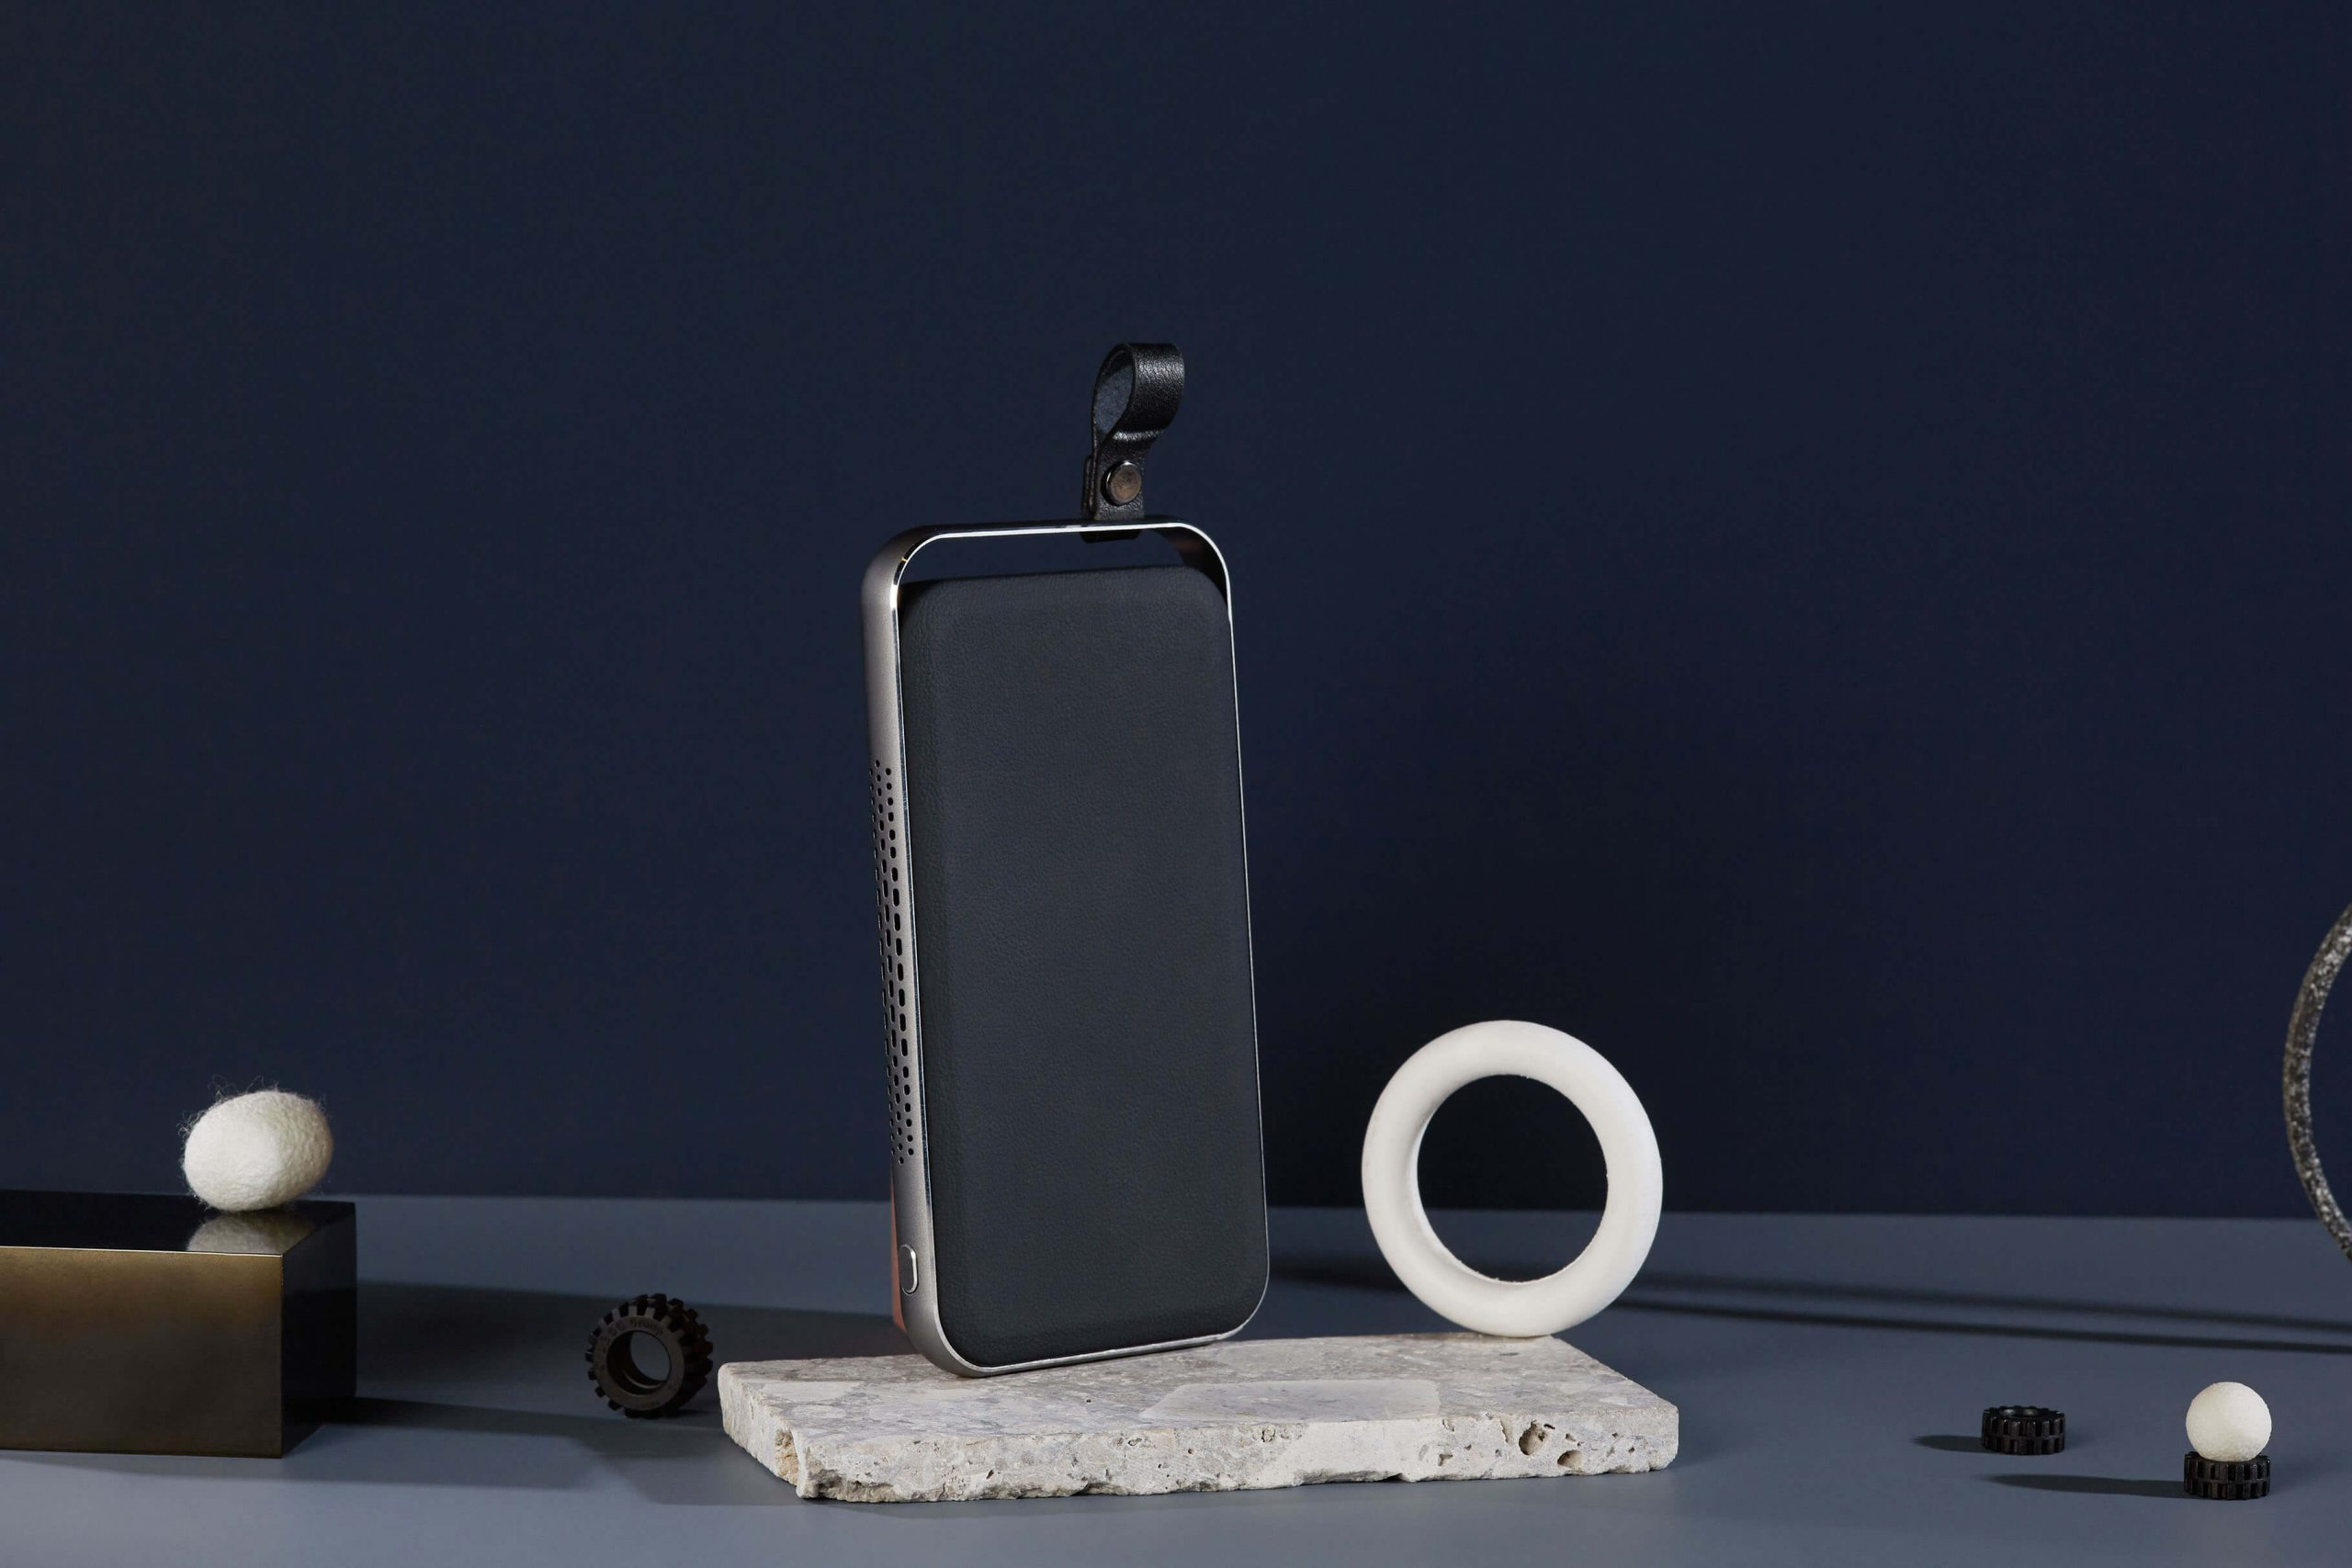 Как я навсегда решил проблему с зарядкой iPhone